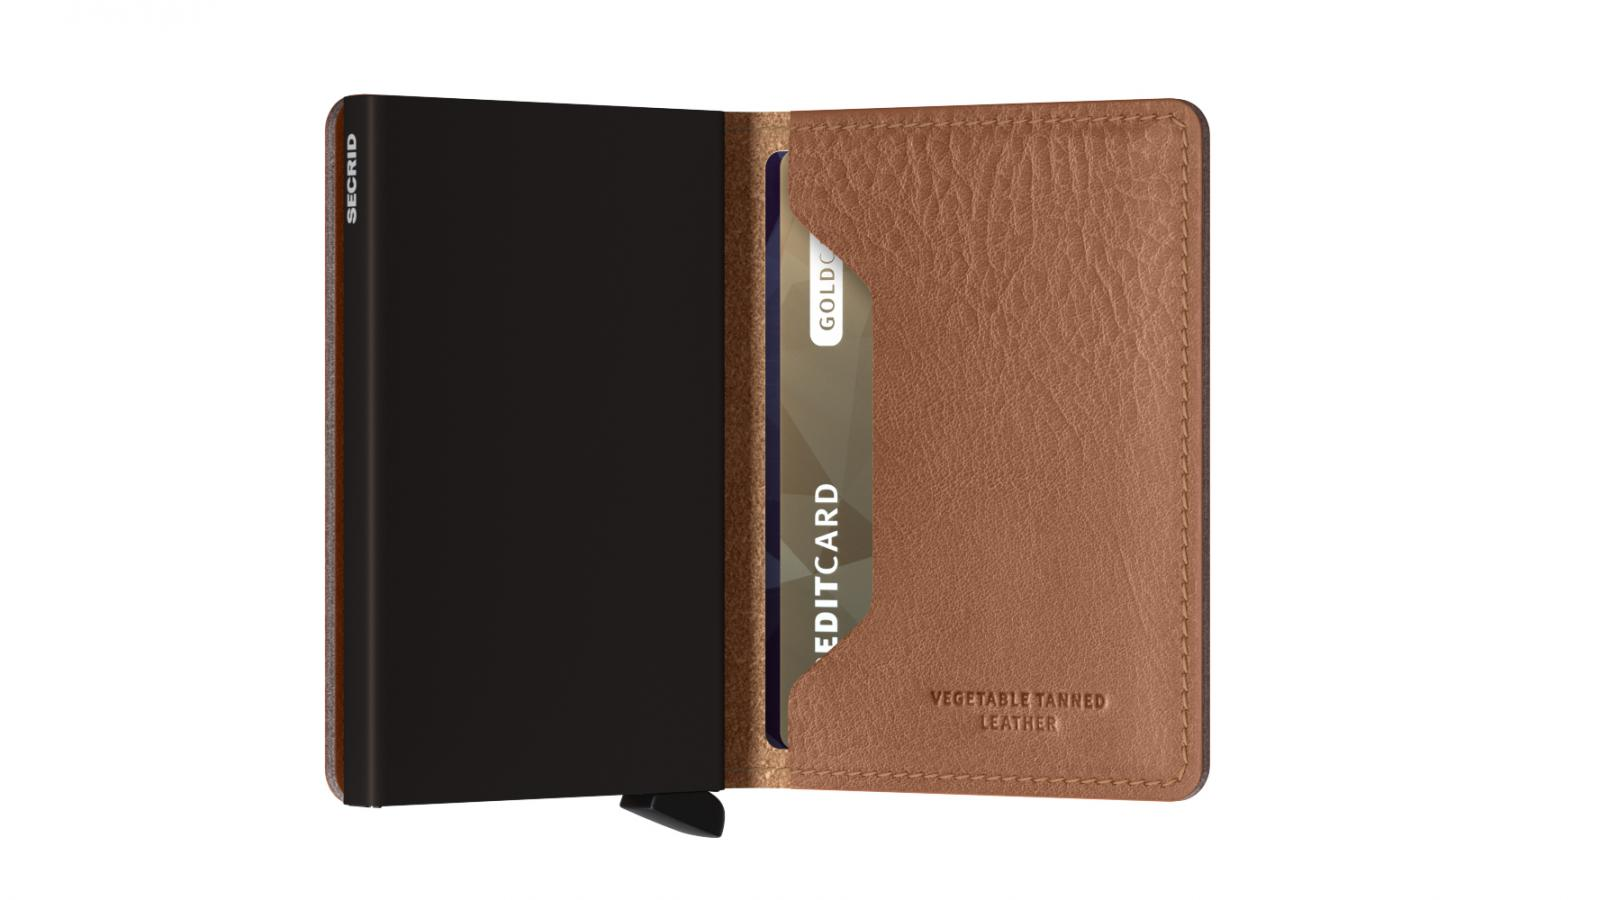 Secrid Slimwallet Veg Espresso Wallet